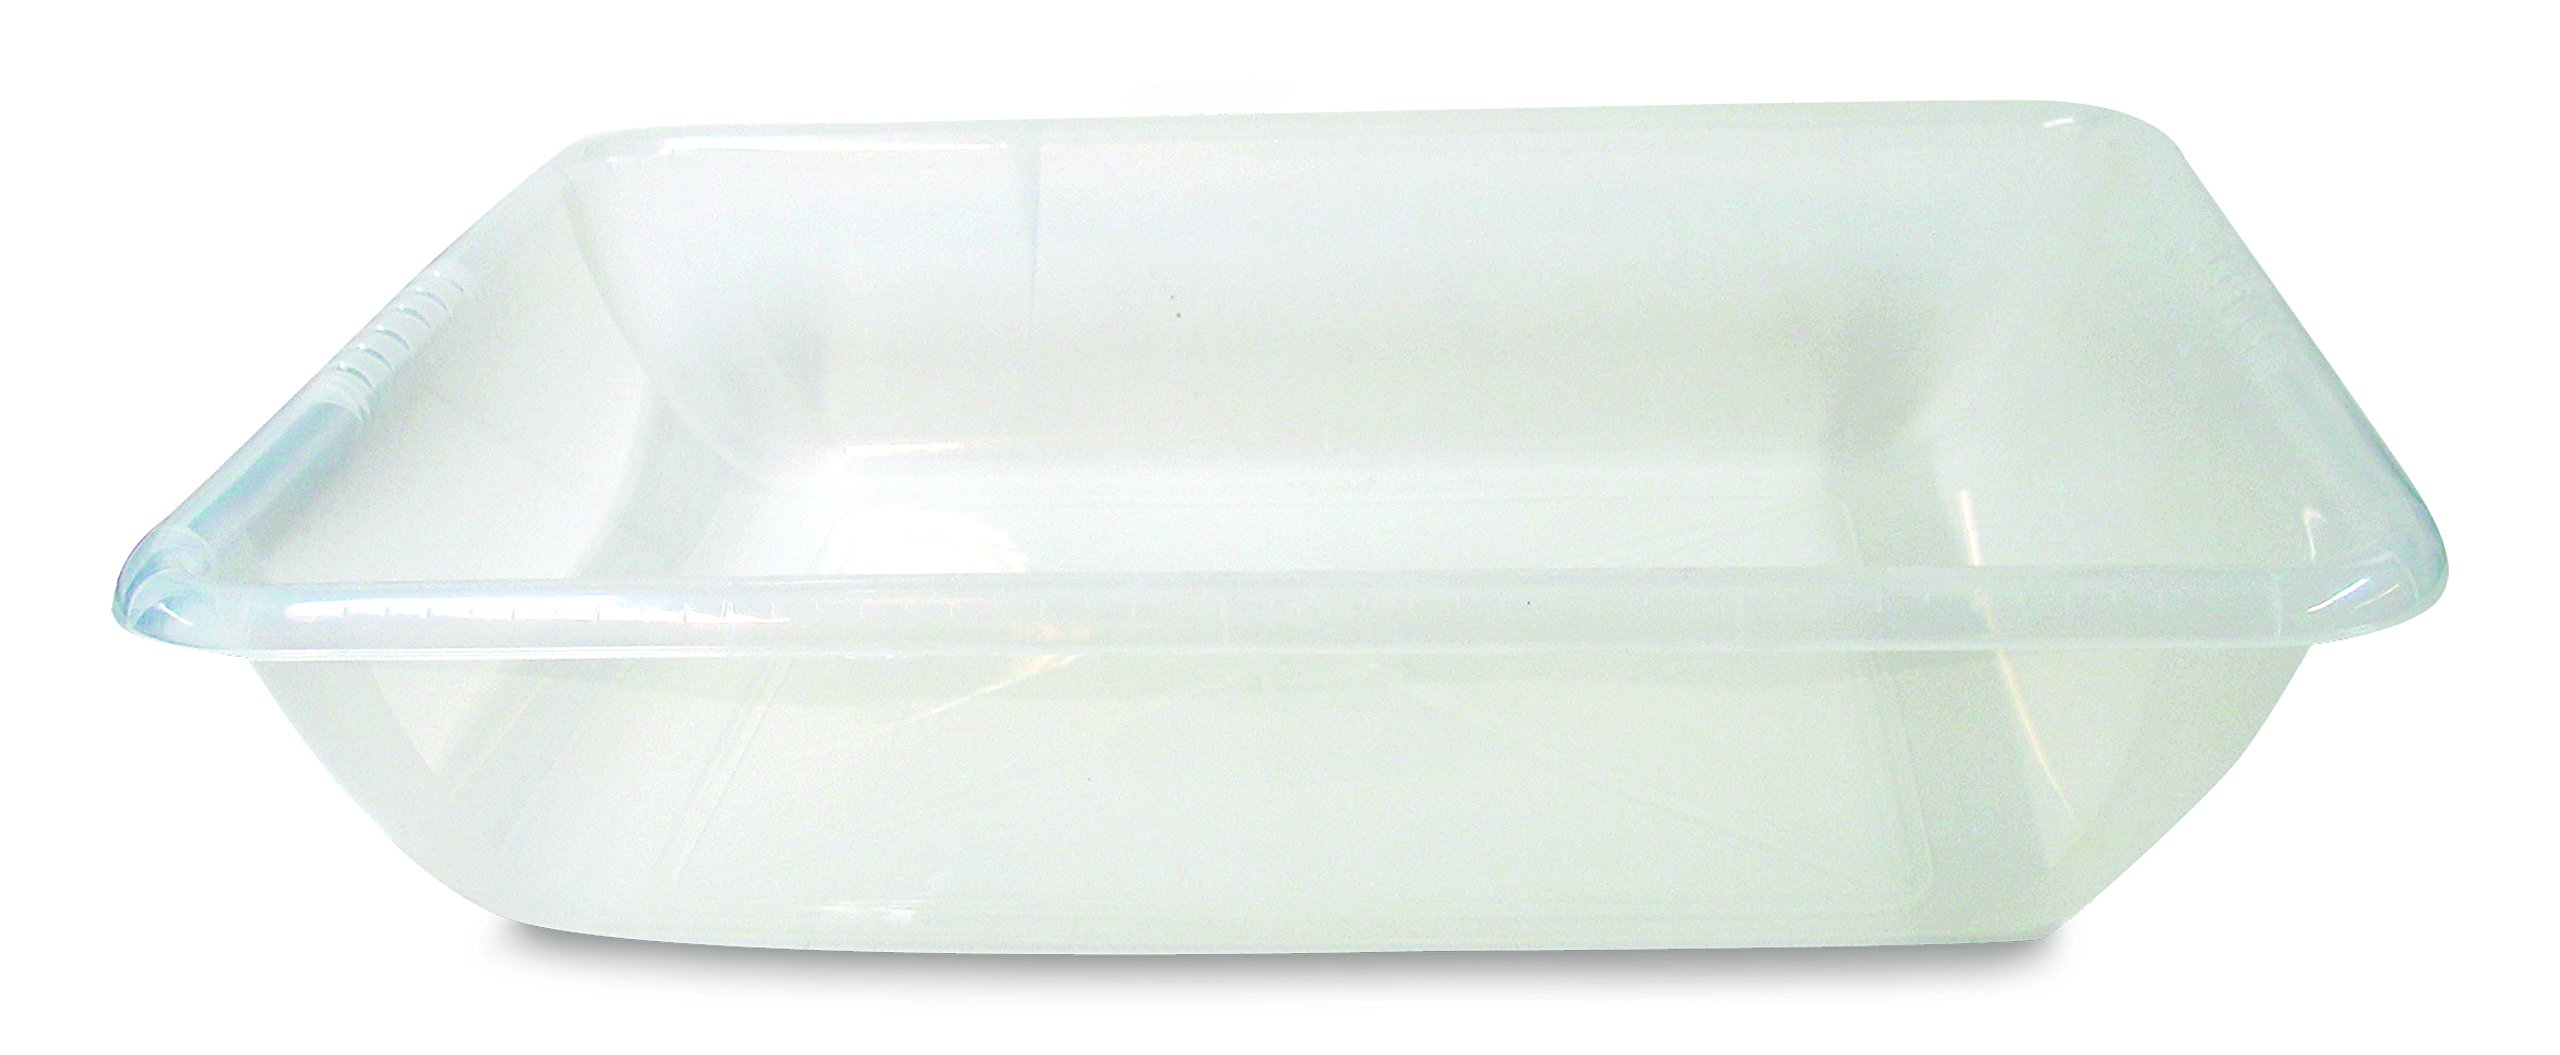 Edushape See-Thru Activity Tub, Translucent